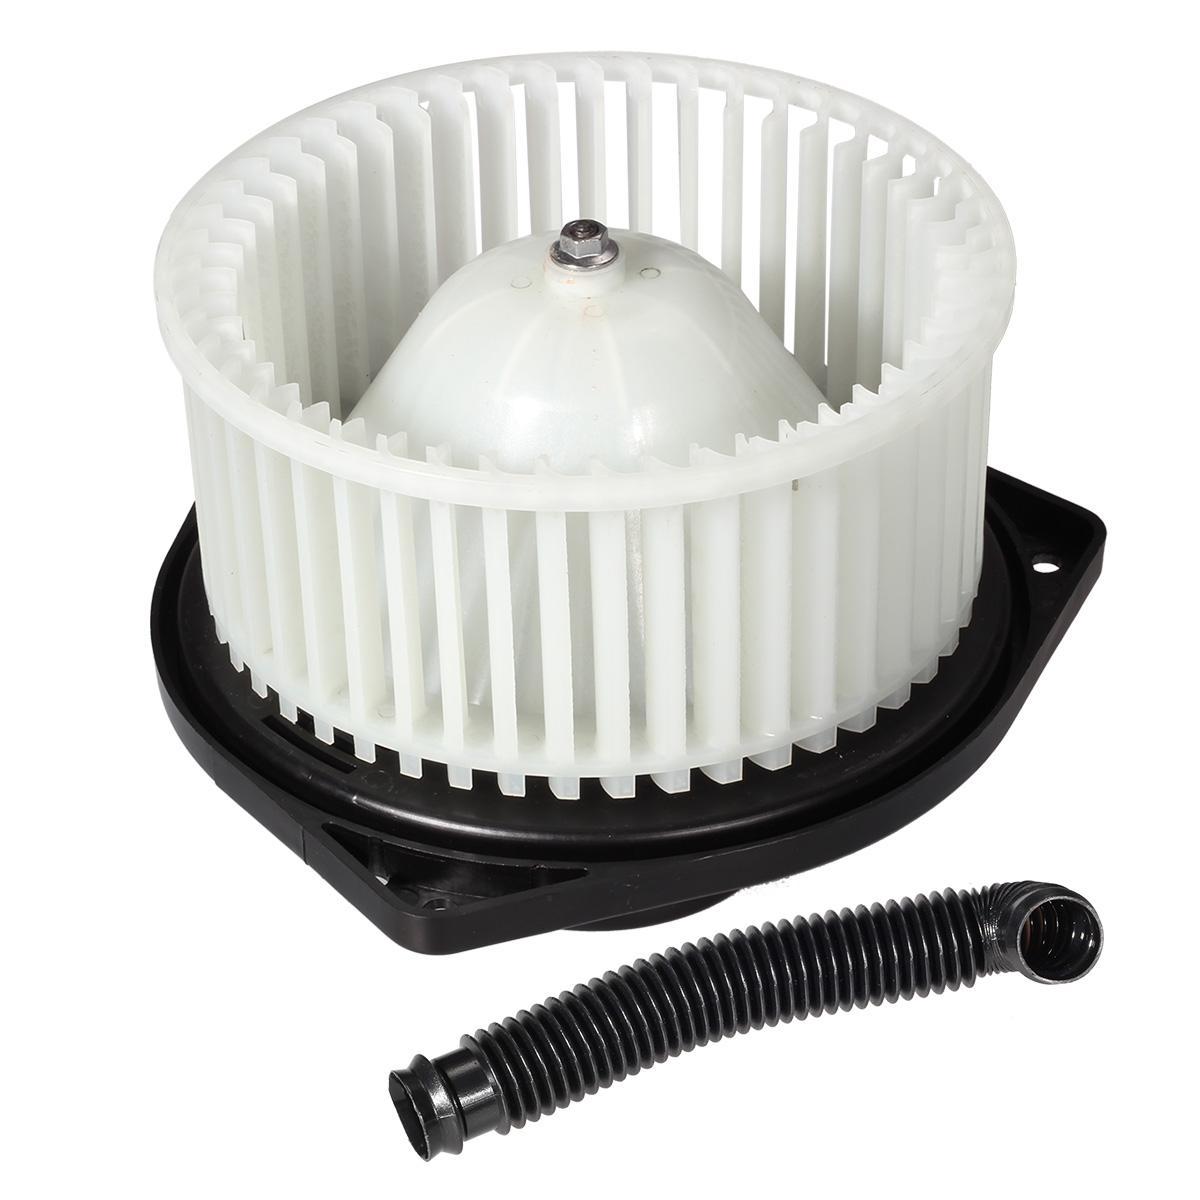 Ac Heatercar Wiring Diagram Library Fan Regulator Circuit Http Wwwpic2flycom Fanregulator Hvac Heater Car Blower Motor W Cage For 2000 2003 Nissan Maxima 700050